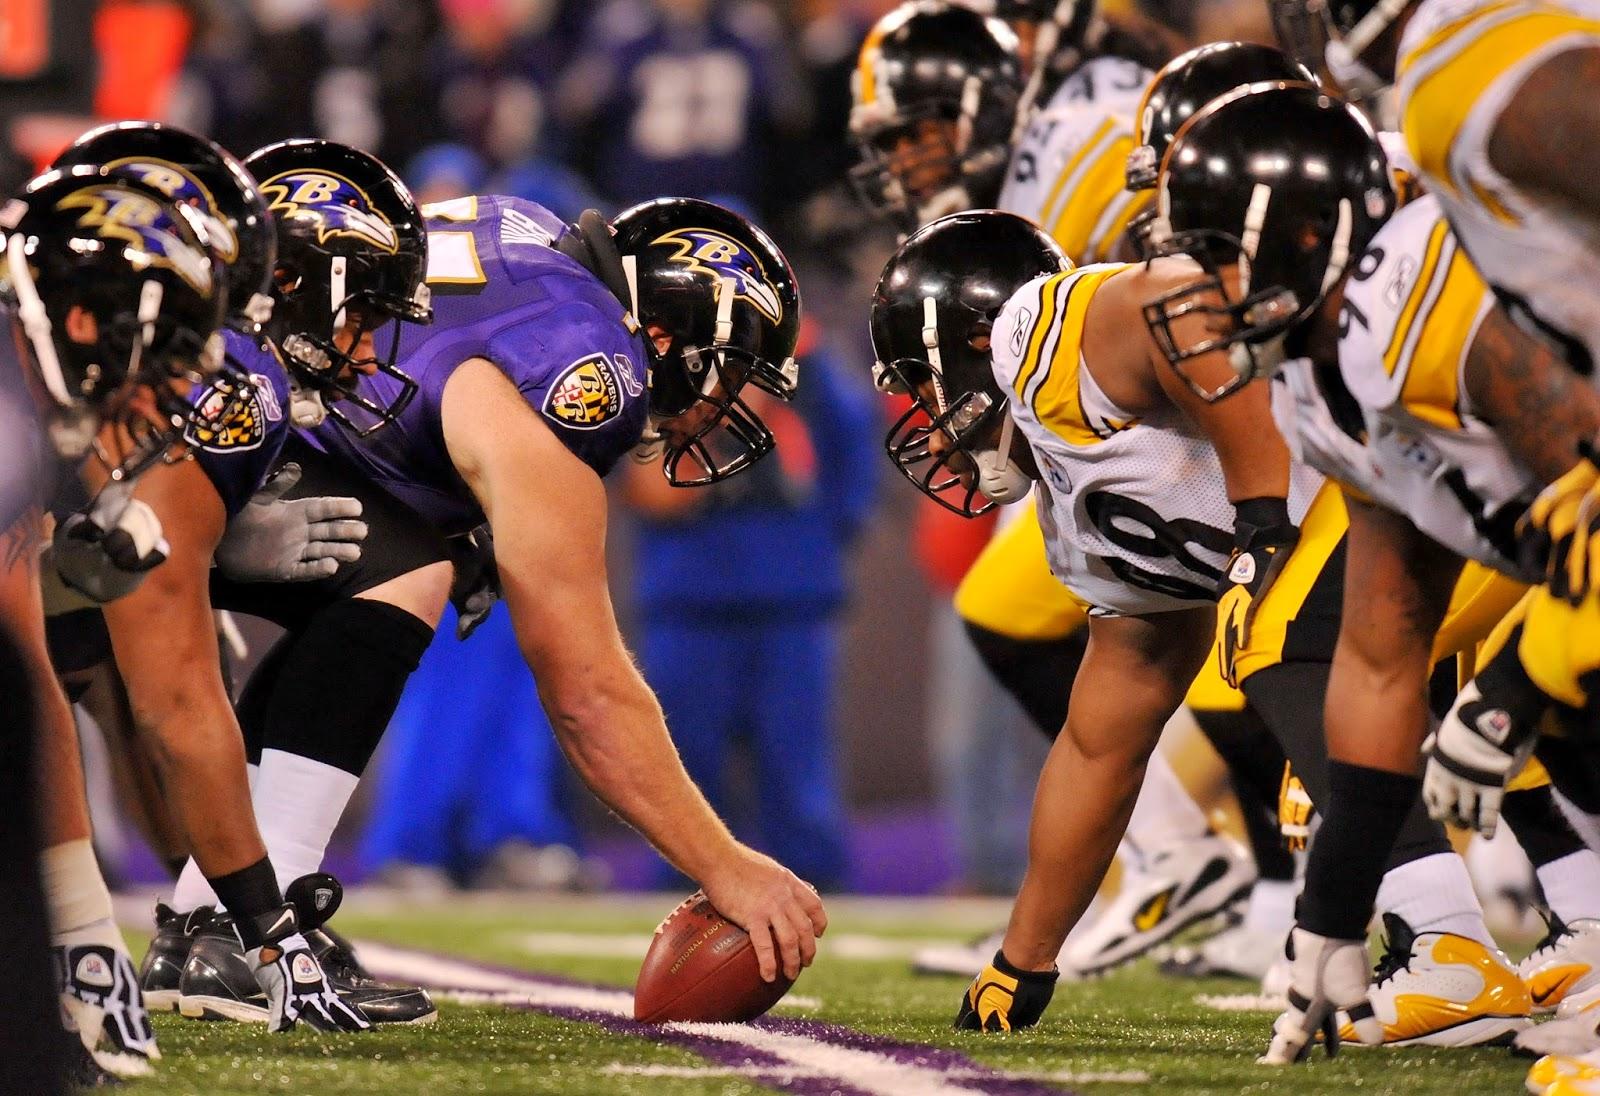 steelers nfl rivalries ravens rivalry vs history sports american polamalu formed yankees